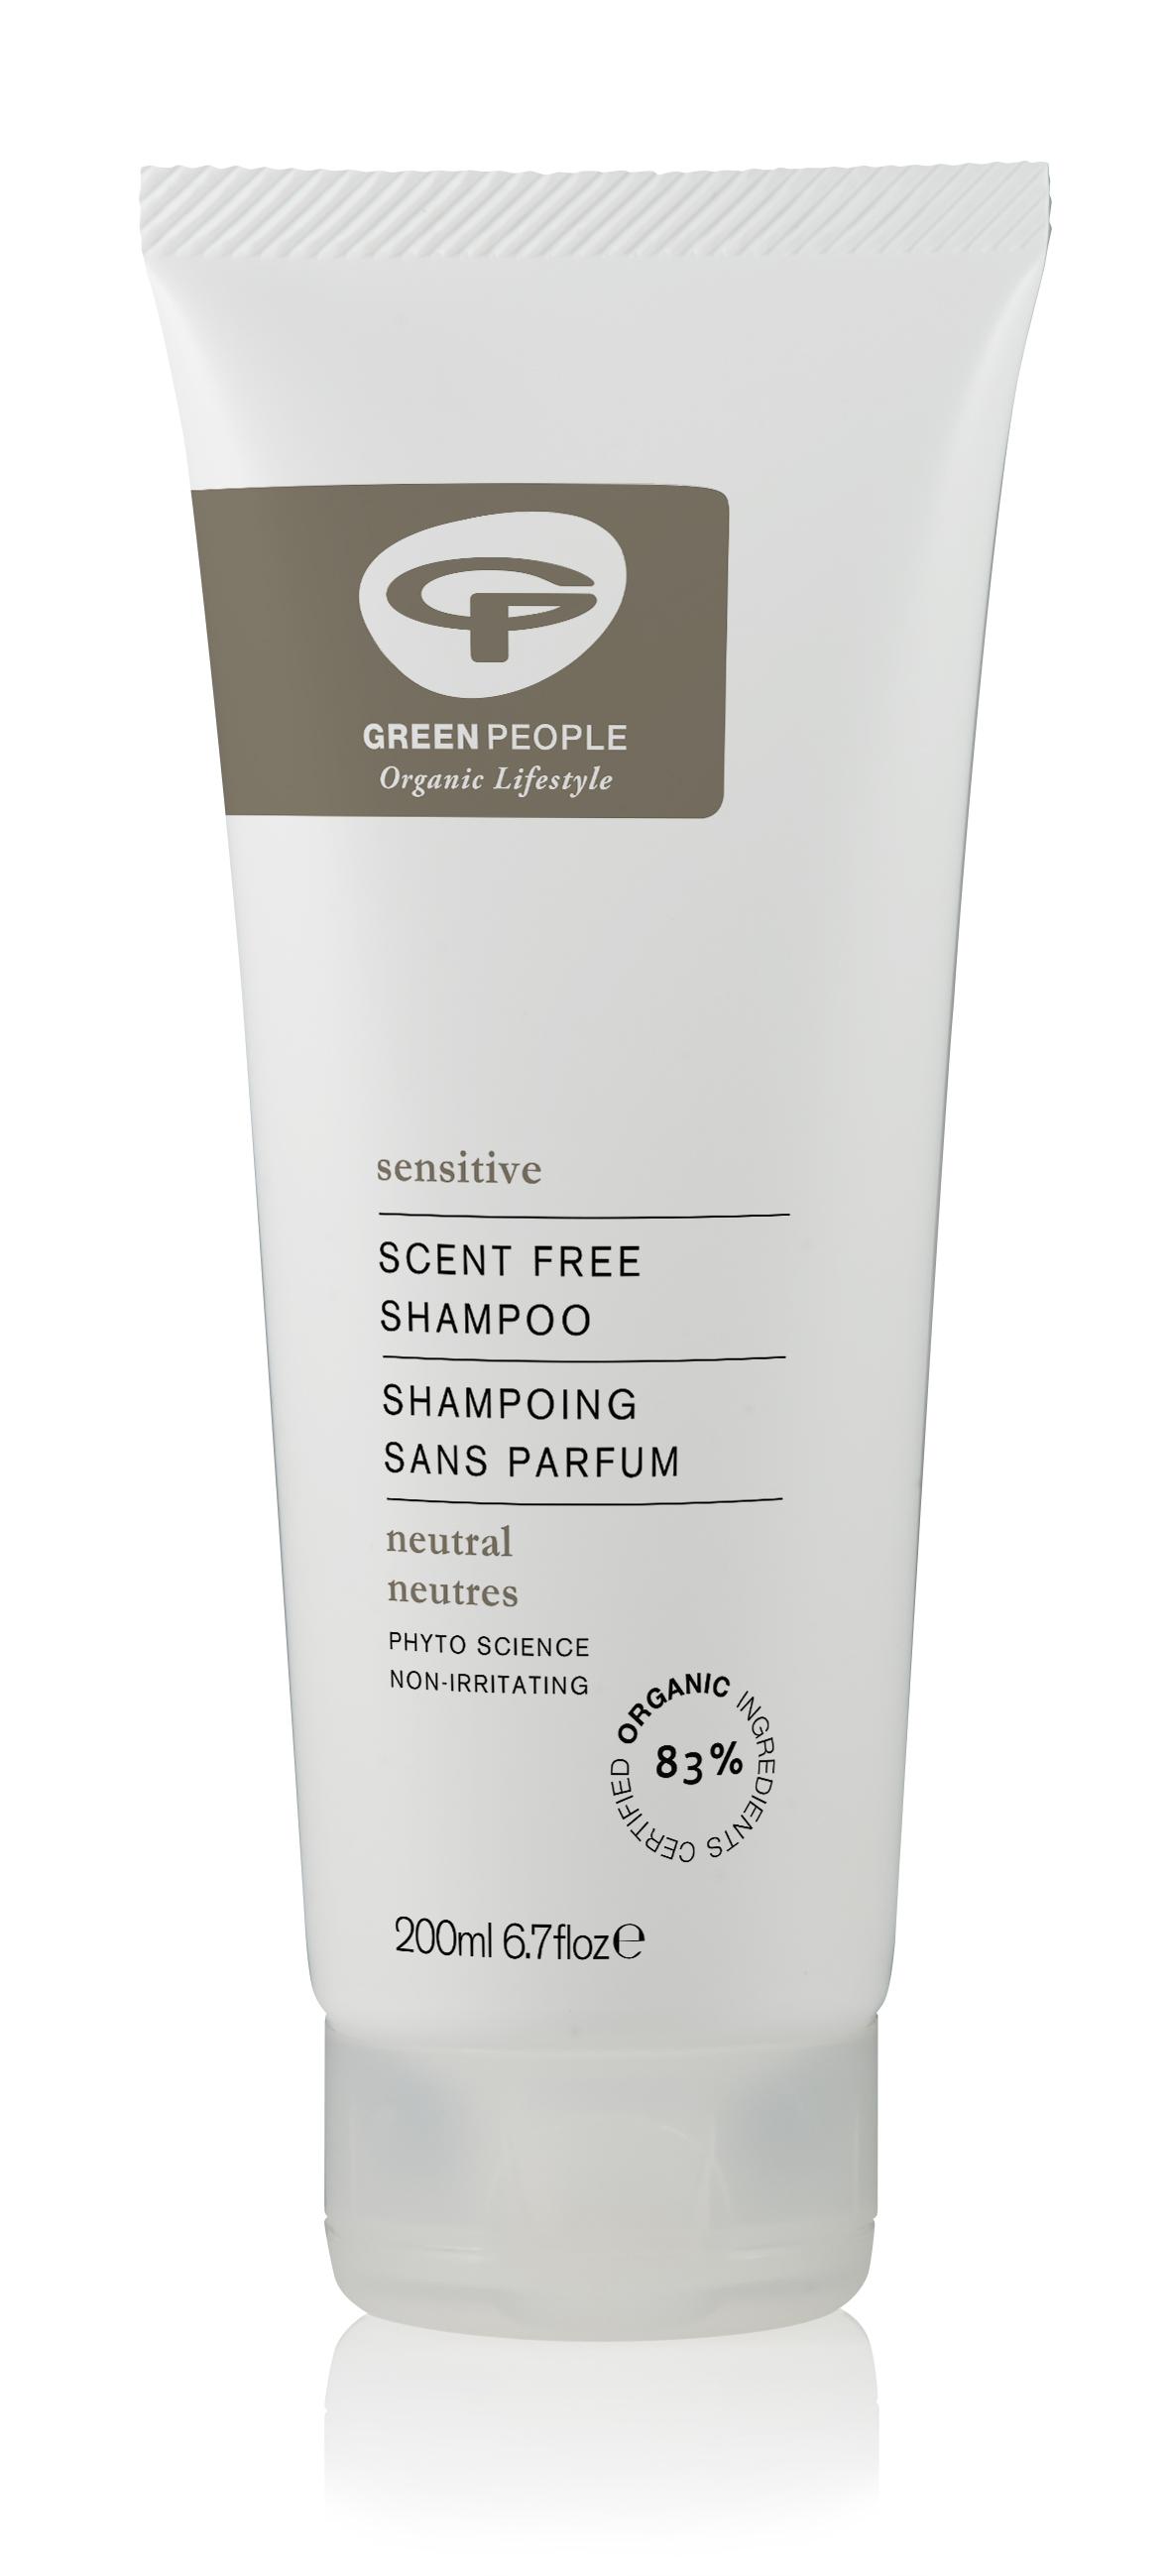 Green People shampoo